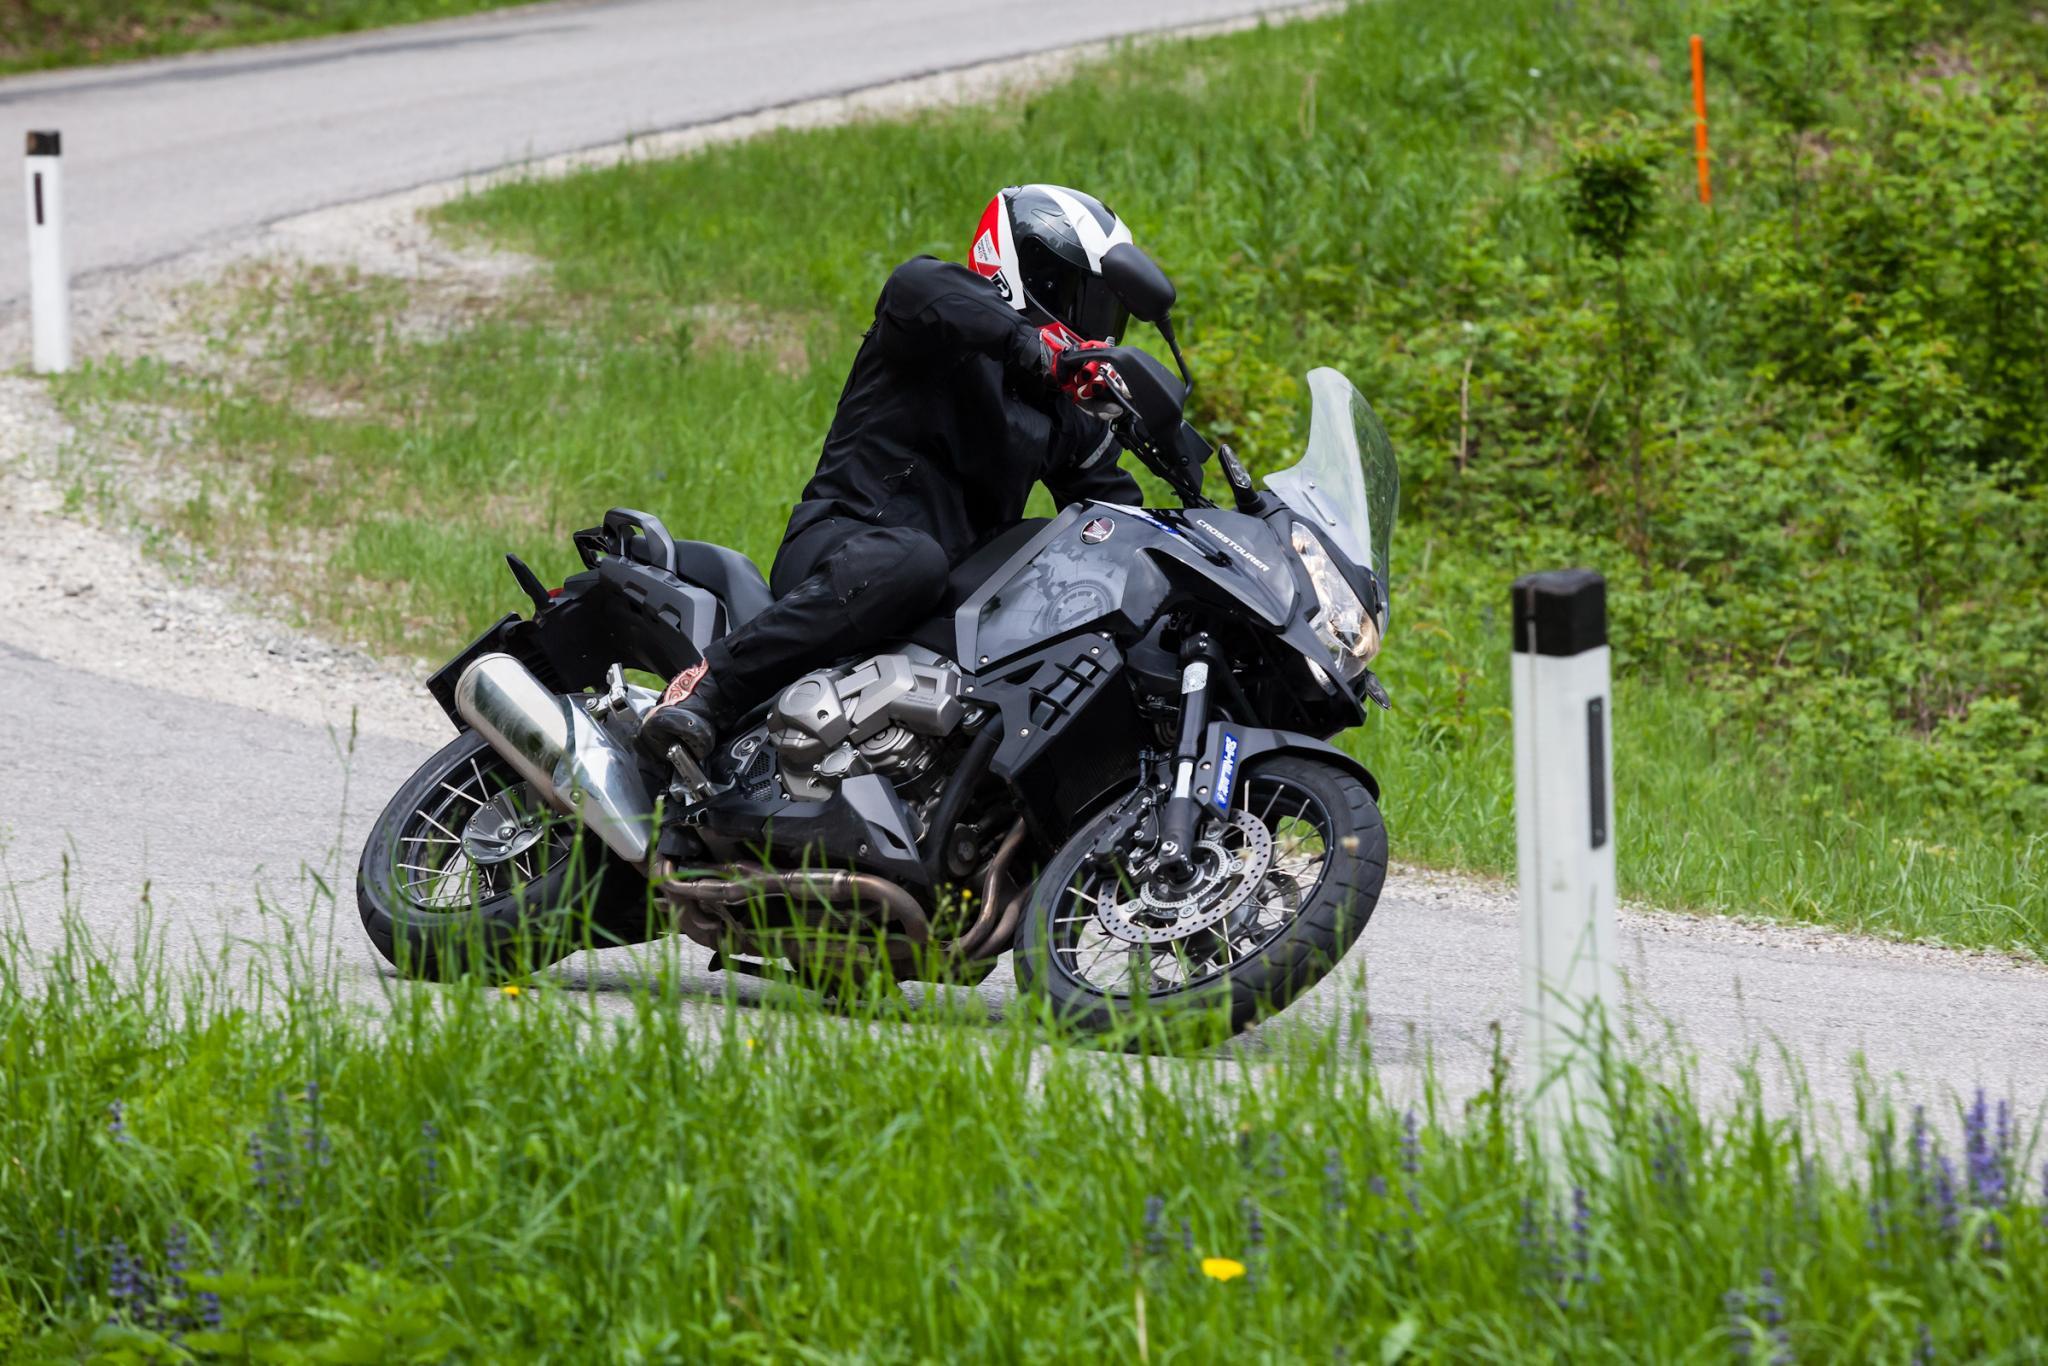 http://www.motorrad-bilder.at/slideshows/291/009569/_MG_6529.jpg